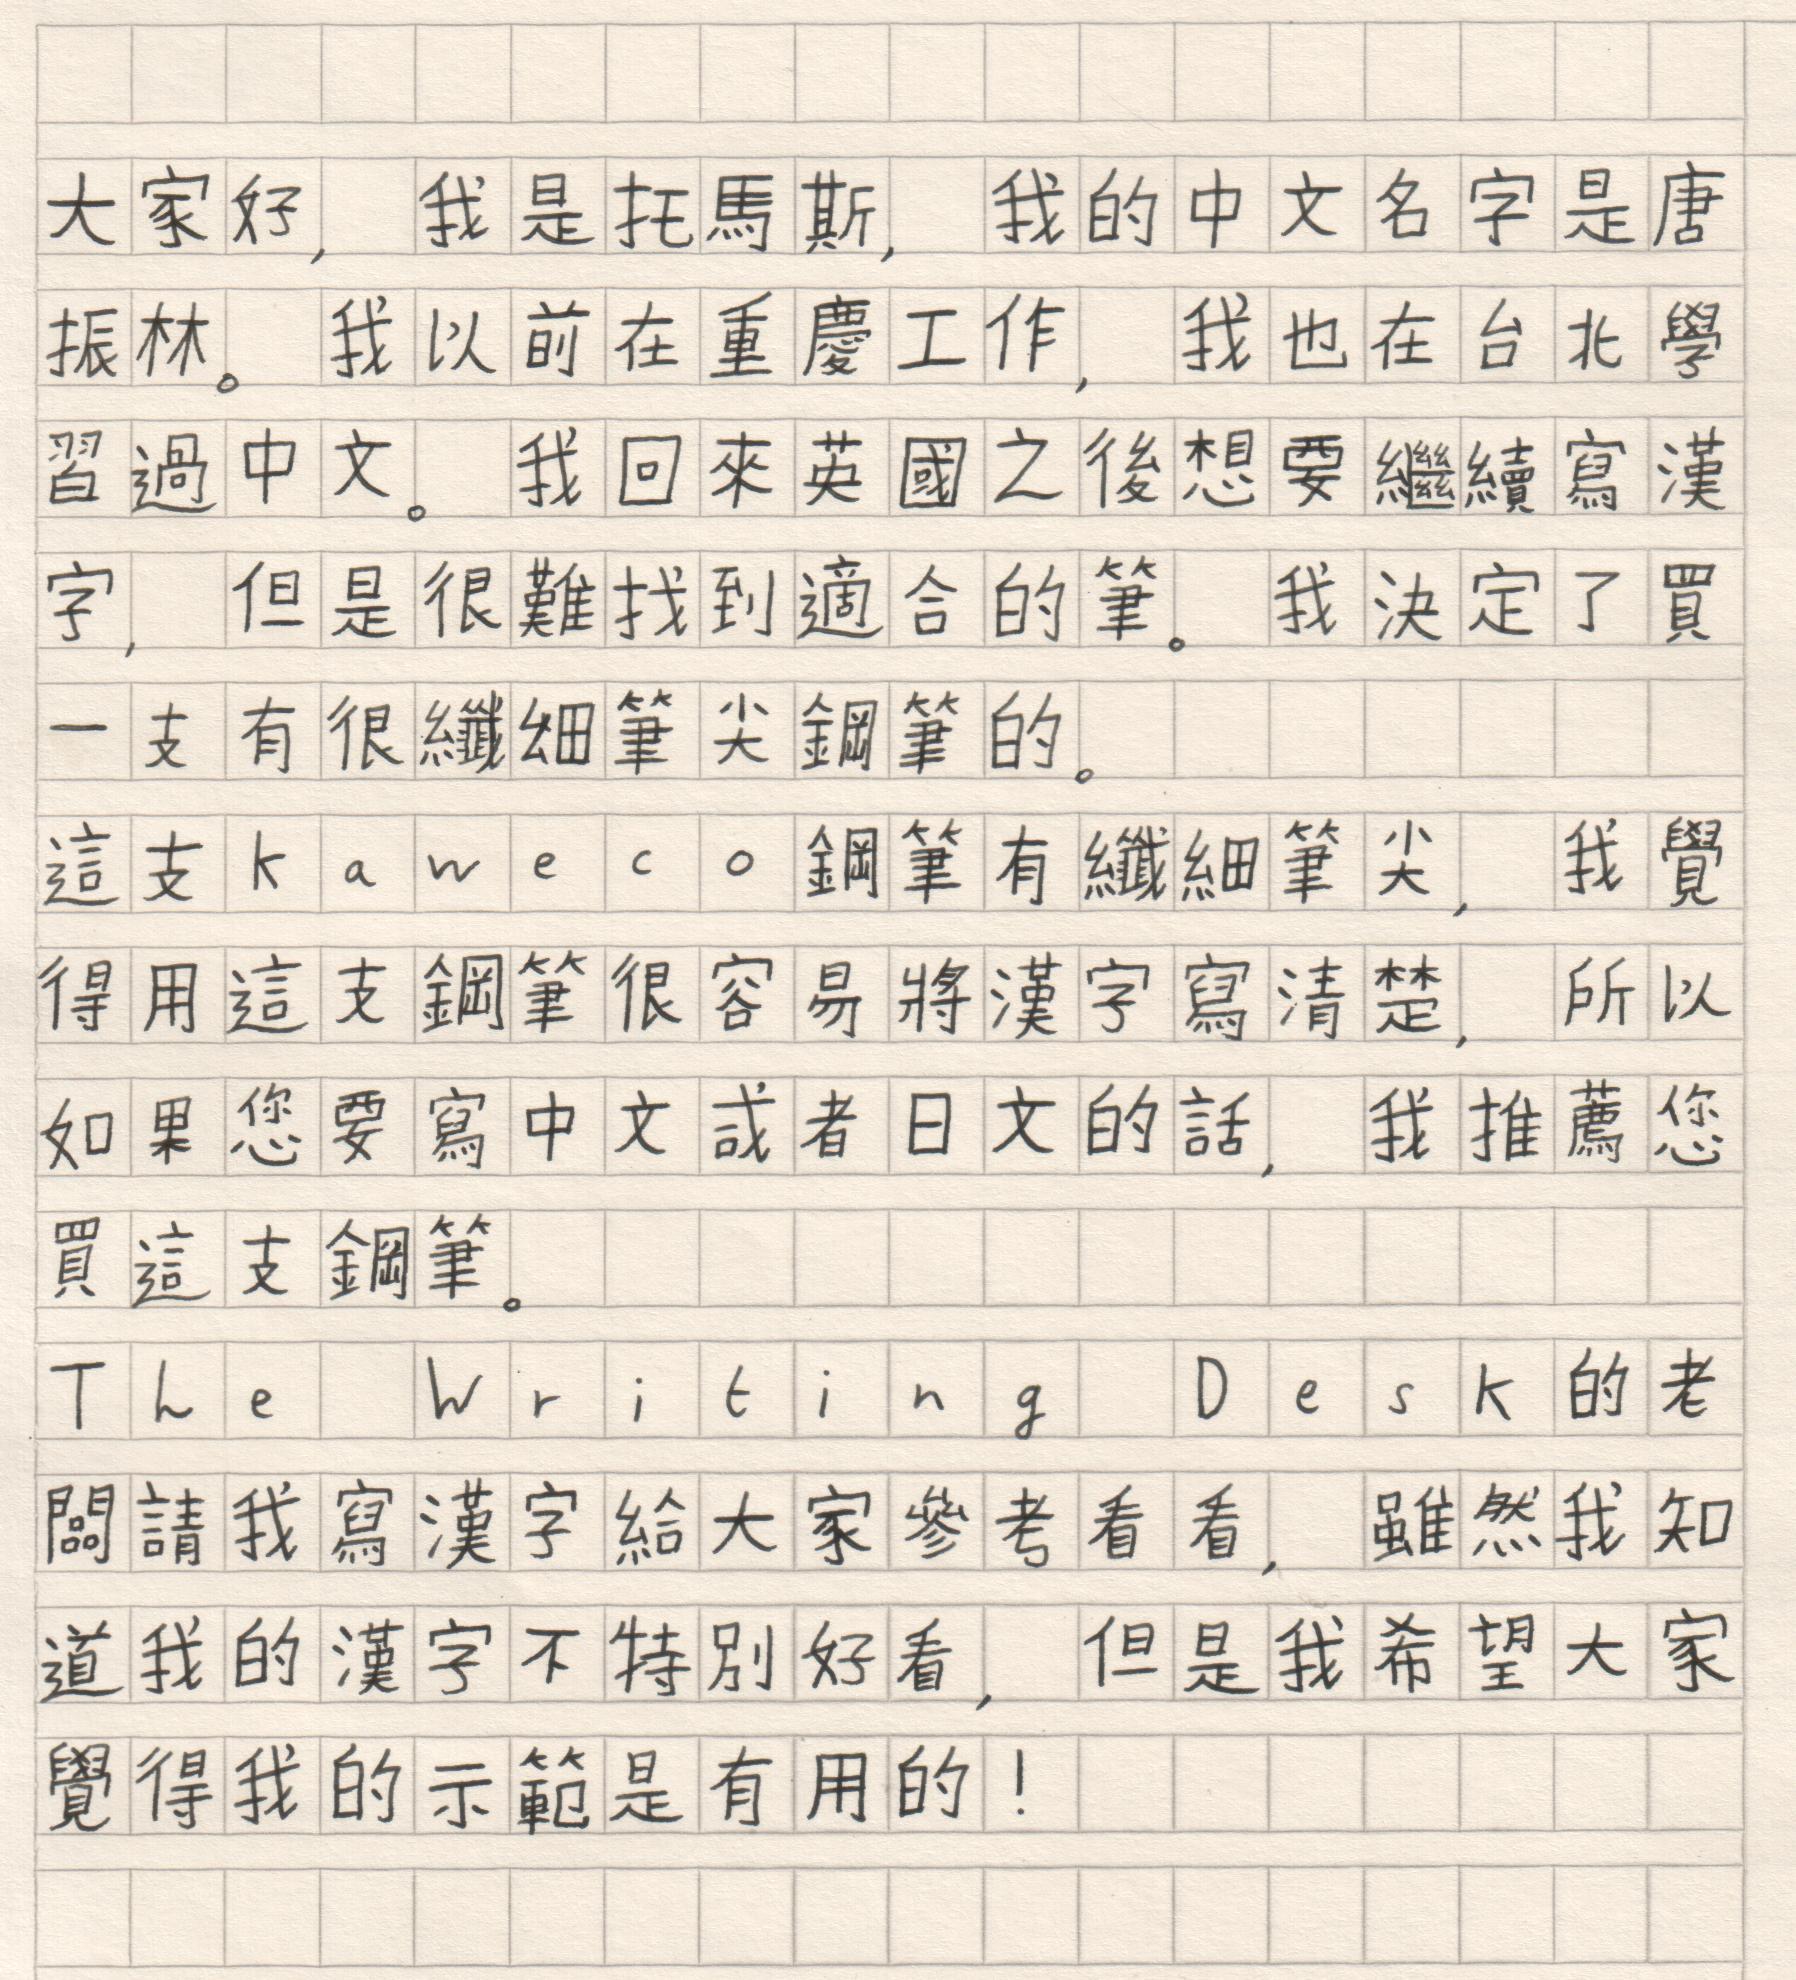 kaweco sport writing sample